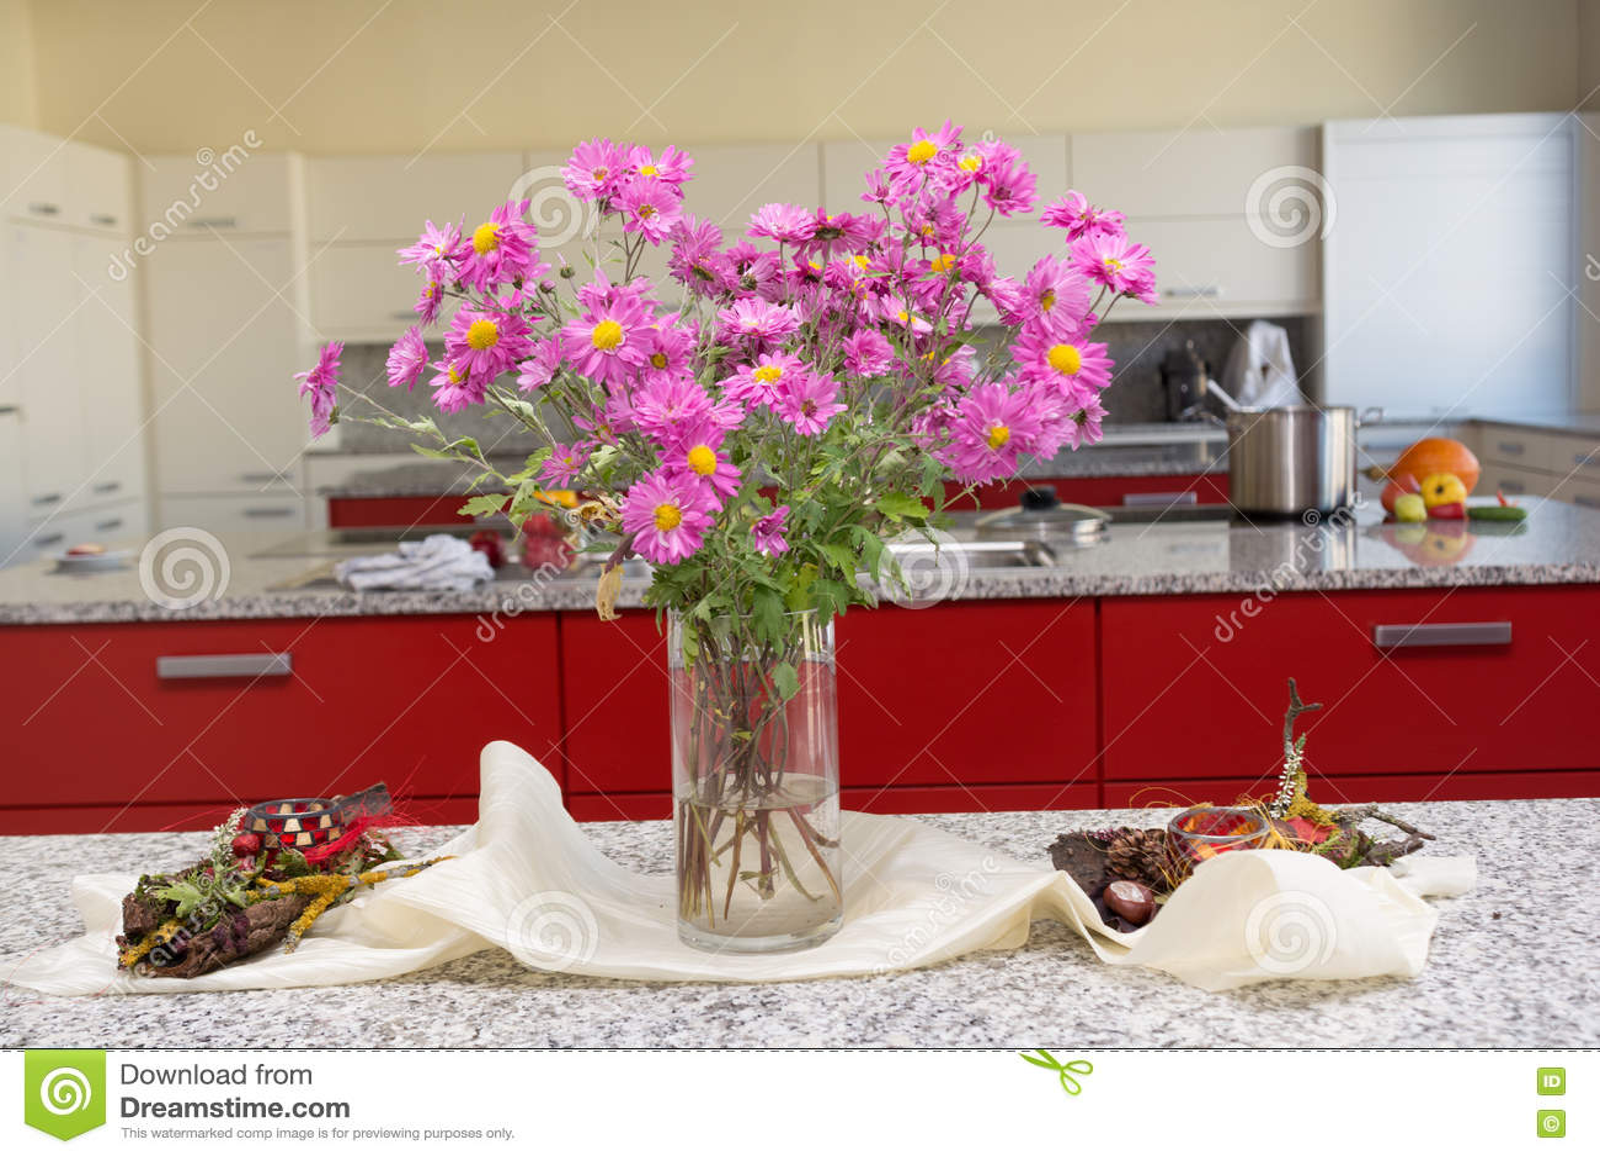 fall kitchen decor pictures of wood cabinets 秋季花束在厨房里库存照片 图片包括有michaelmas 开花的 绽放 秋天 与michaelmas雏菊的强的光亮桌装饰在厨房里